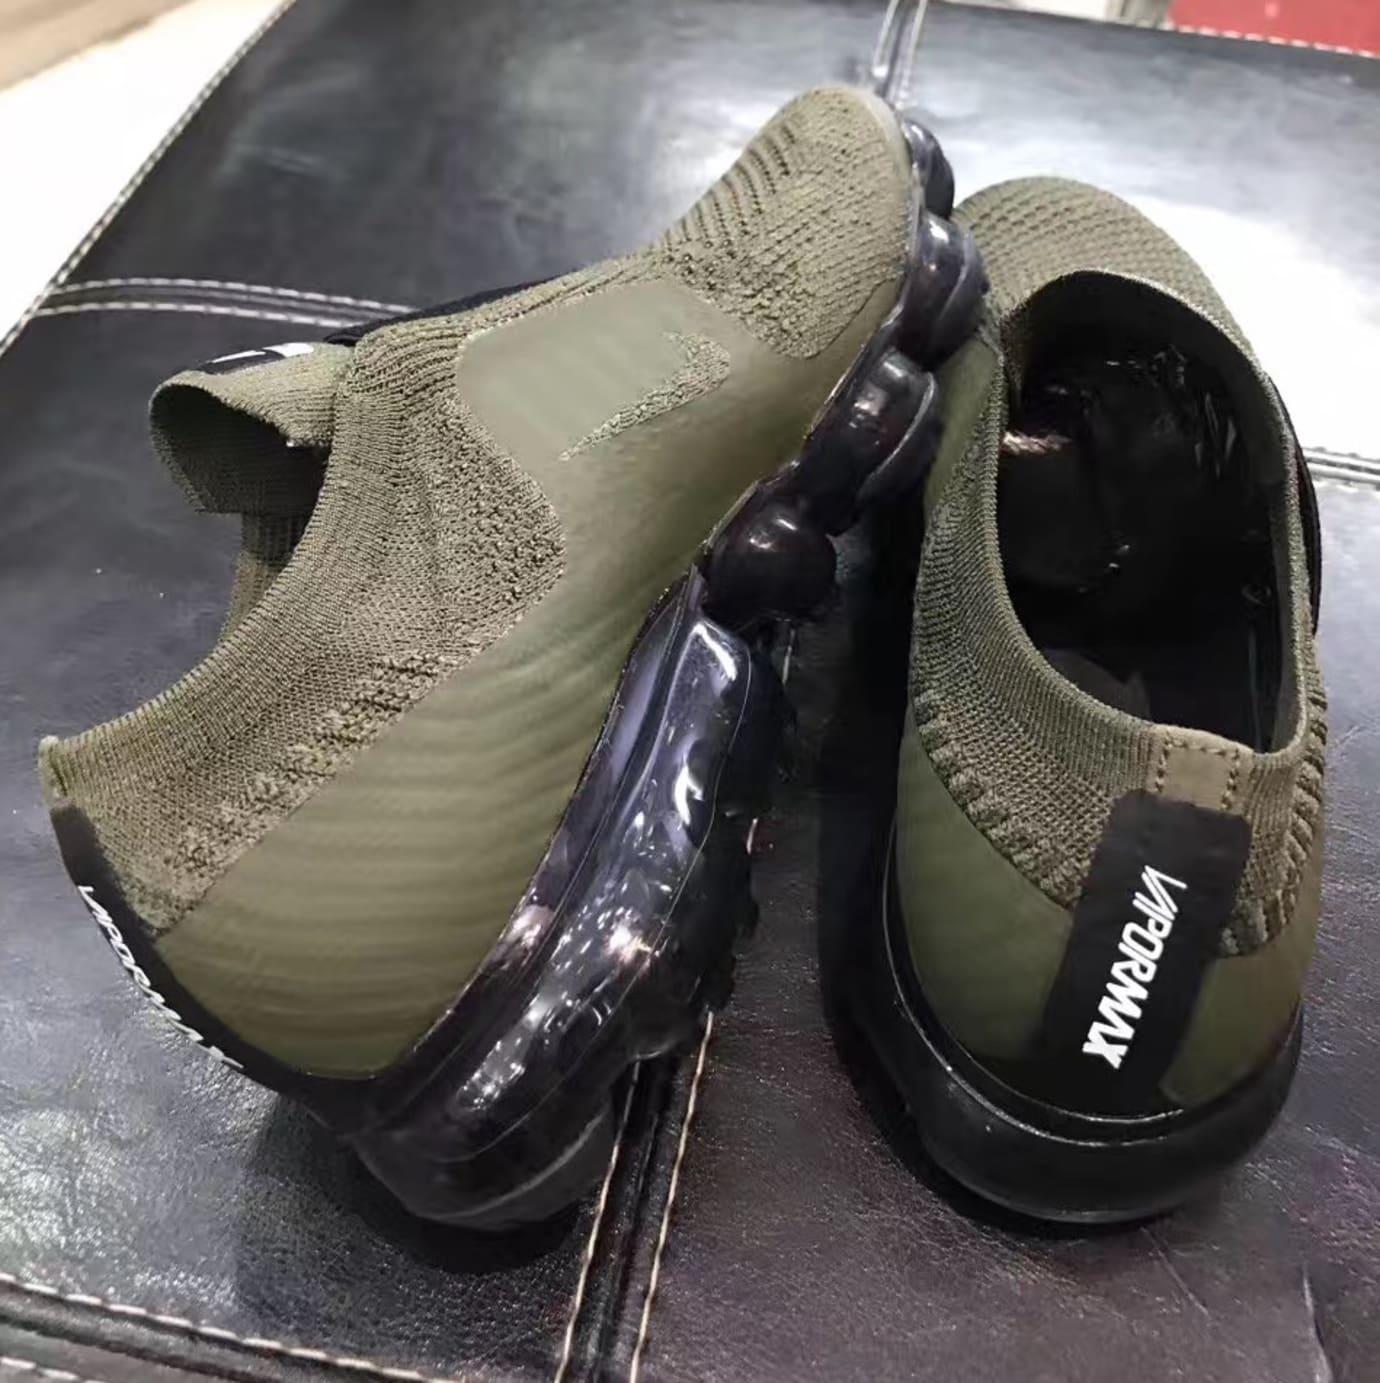 4c0bcf8de43 Image via Sneakerfiles Nike VaporMax Olive Black (Pair)